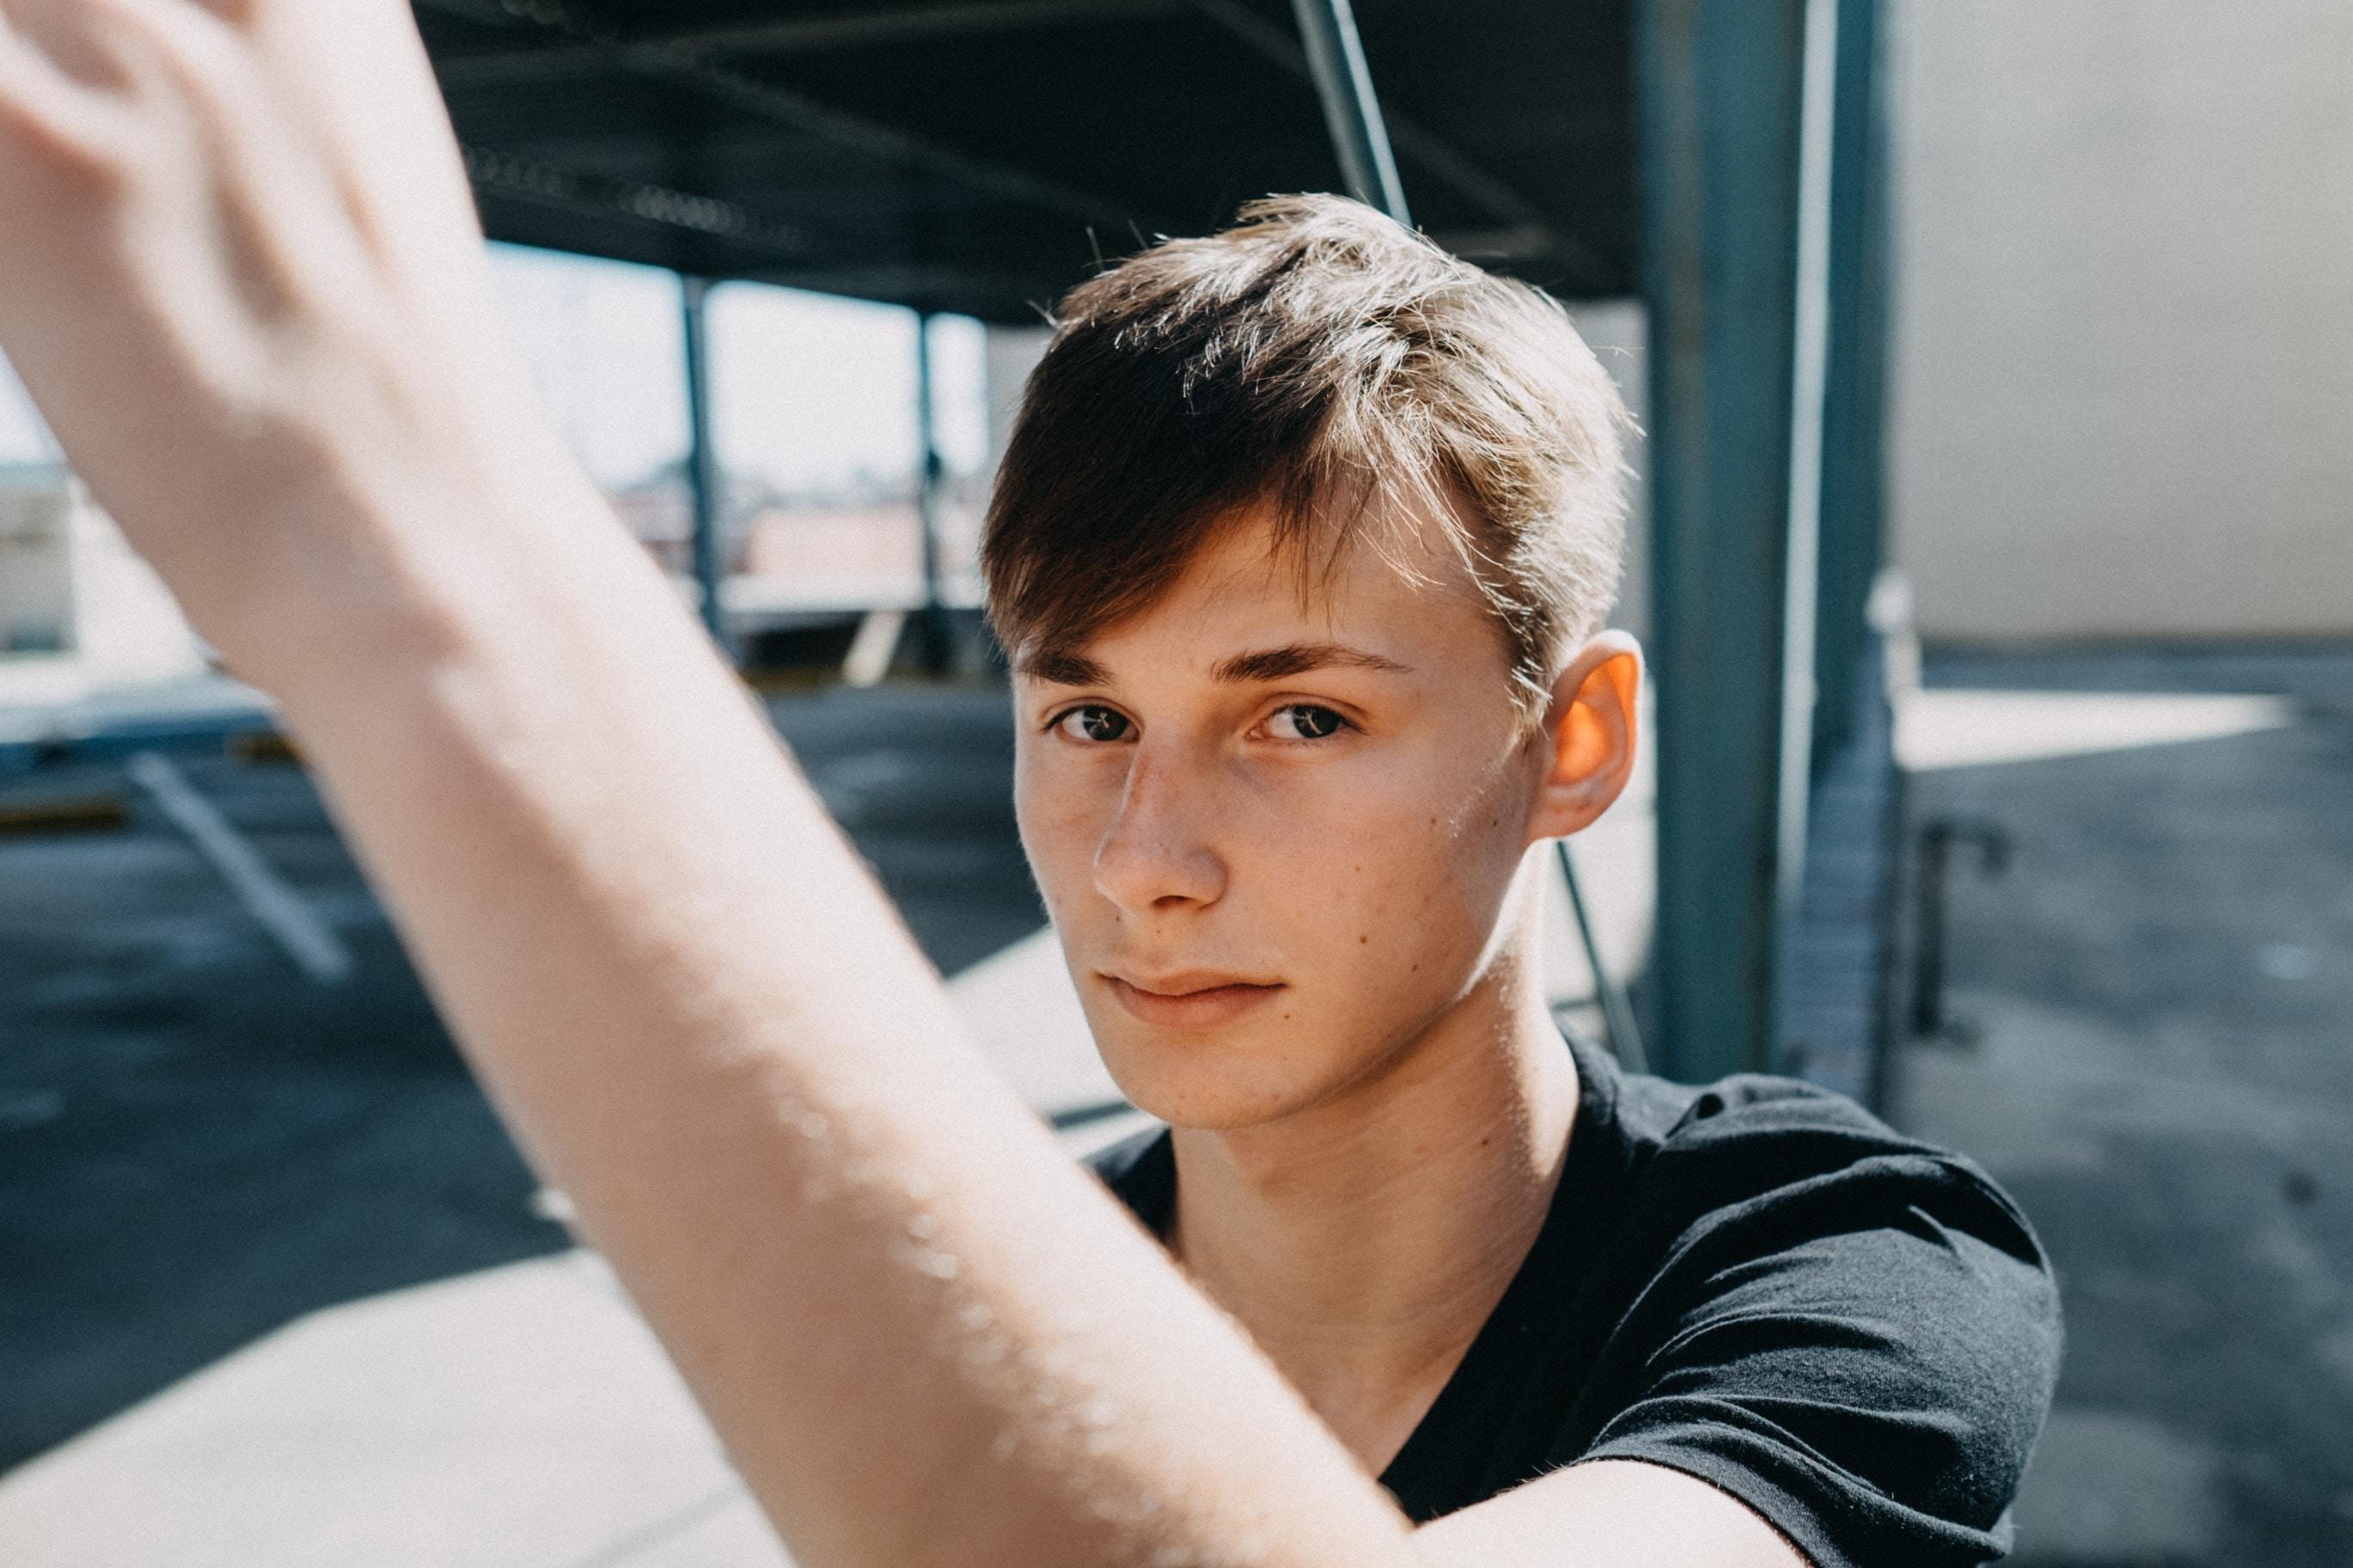 selective focus of man wearing gray shirt